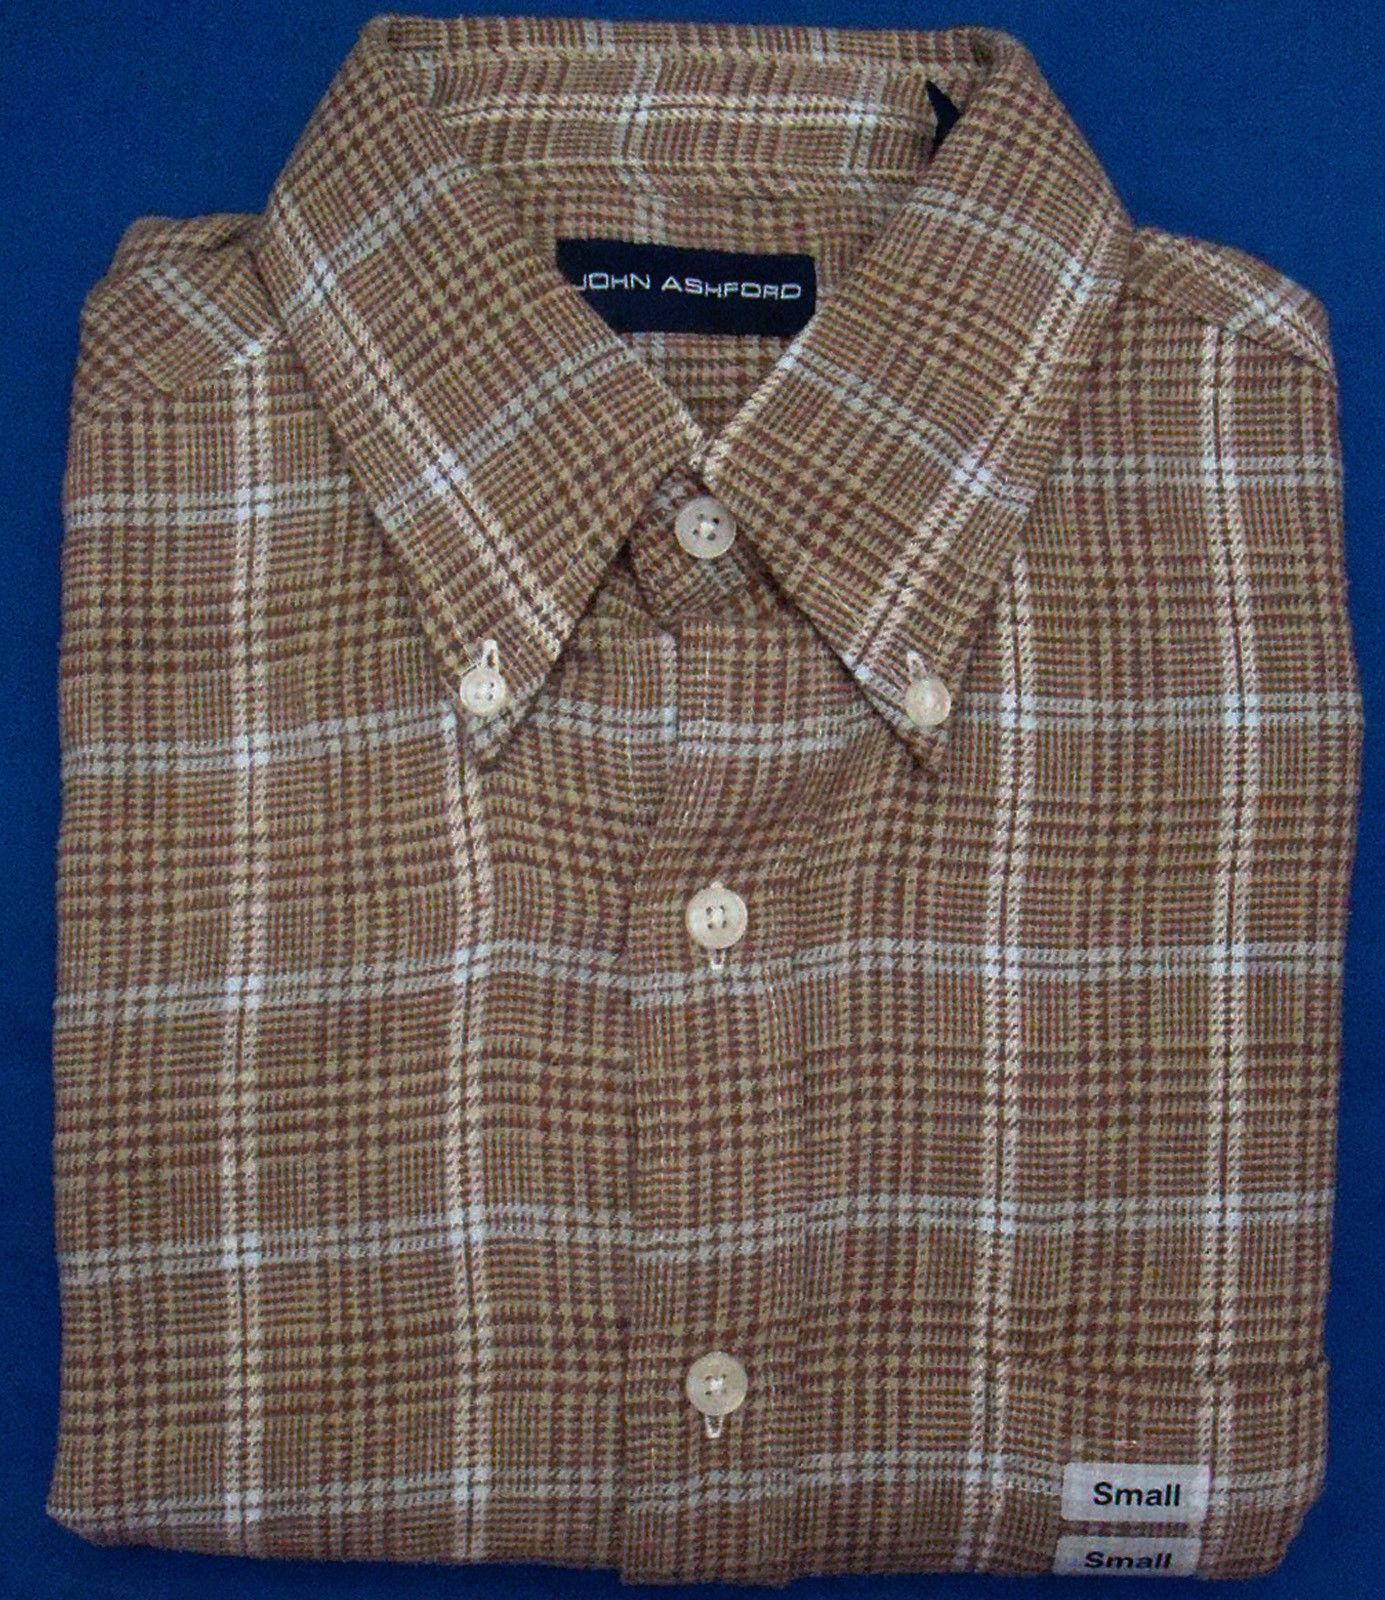 John Ashford - Brown Checked Long Sleeve Flannel Shirt - Size Small